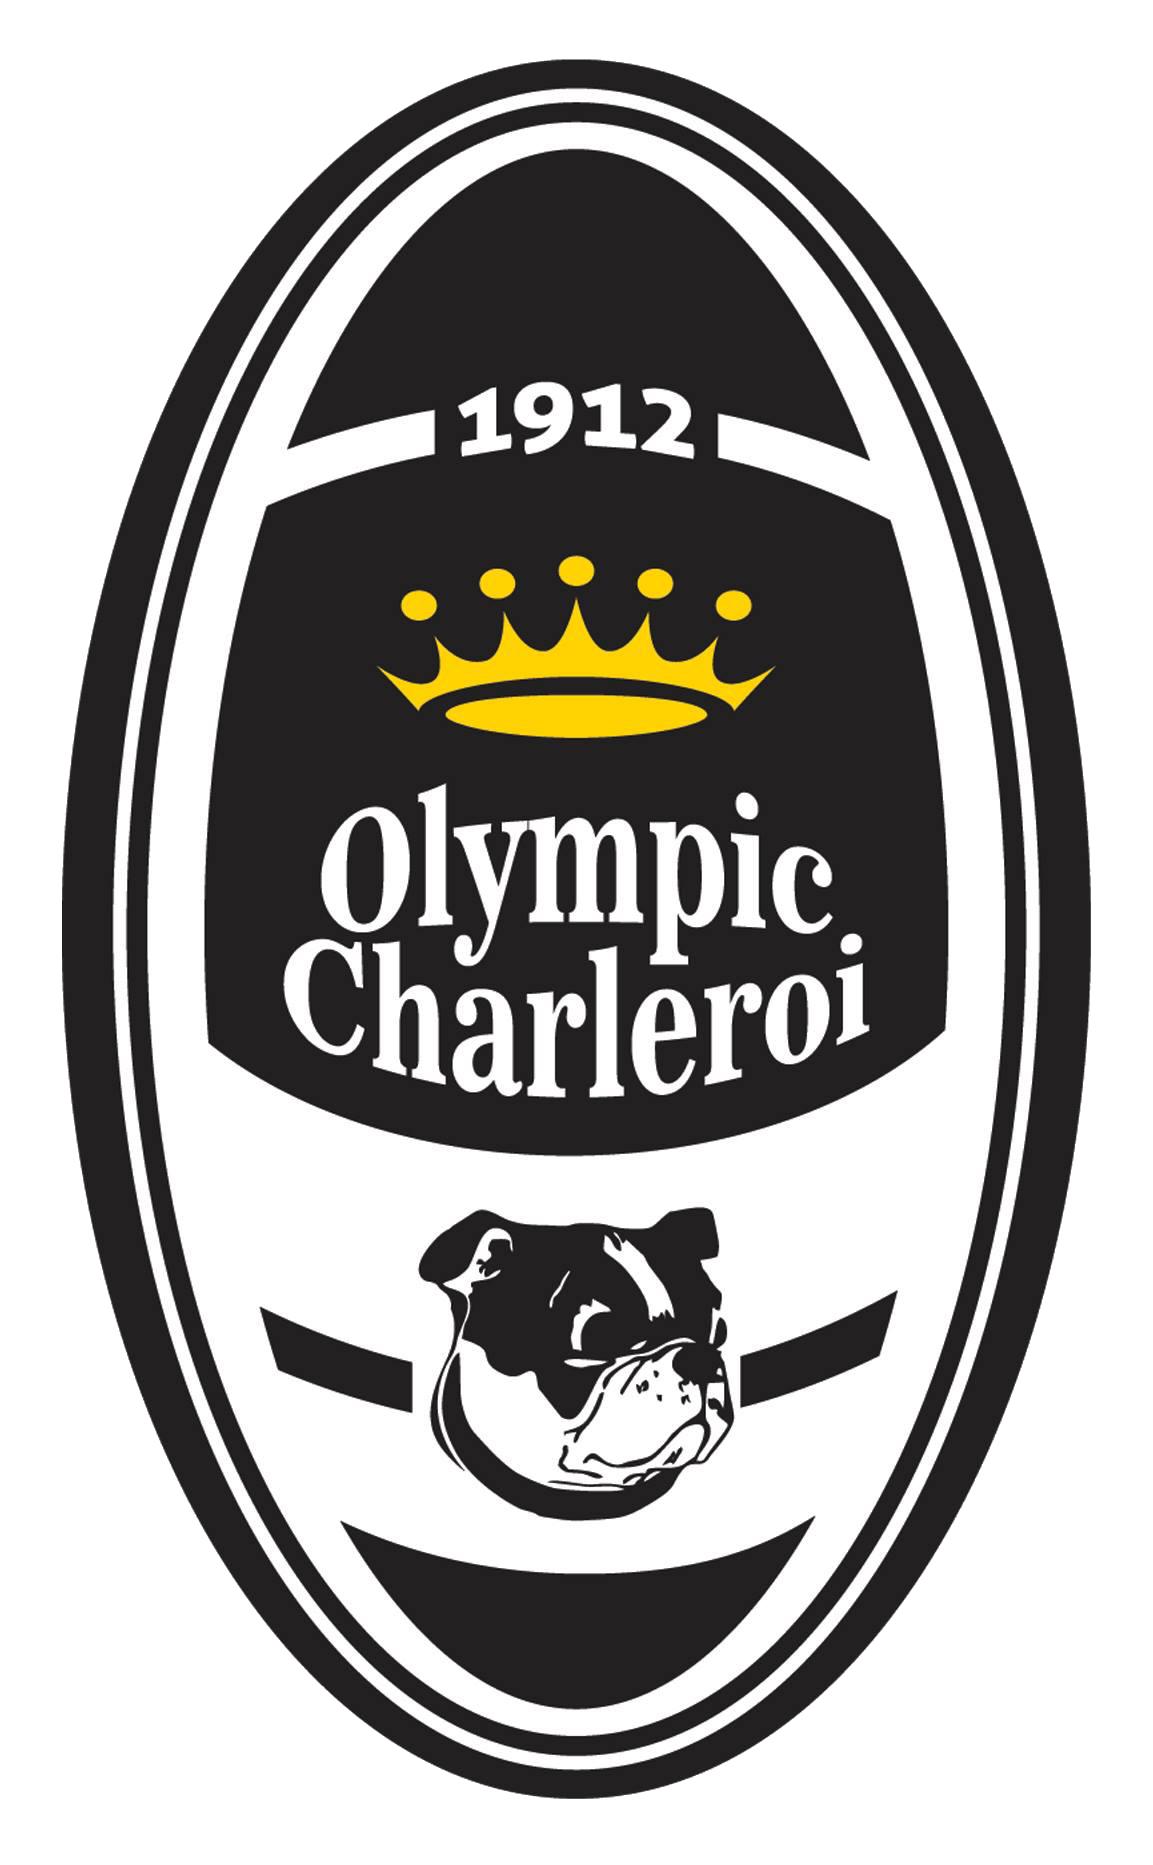 Olympic Charleroi logo